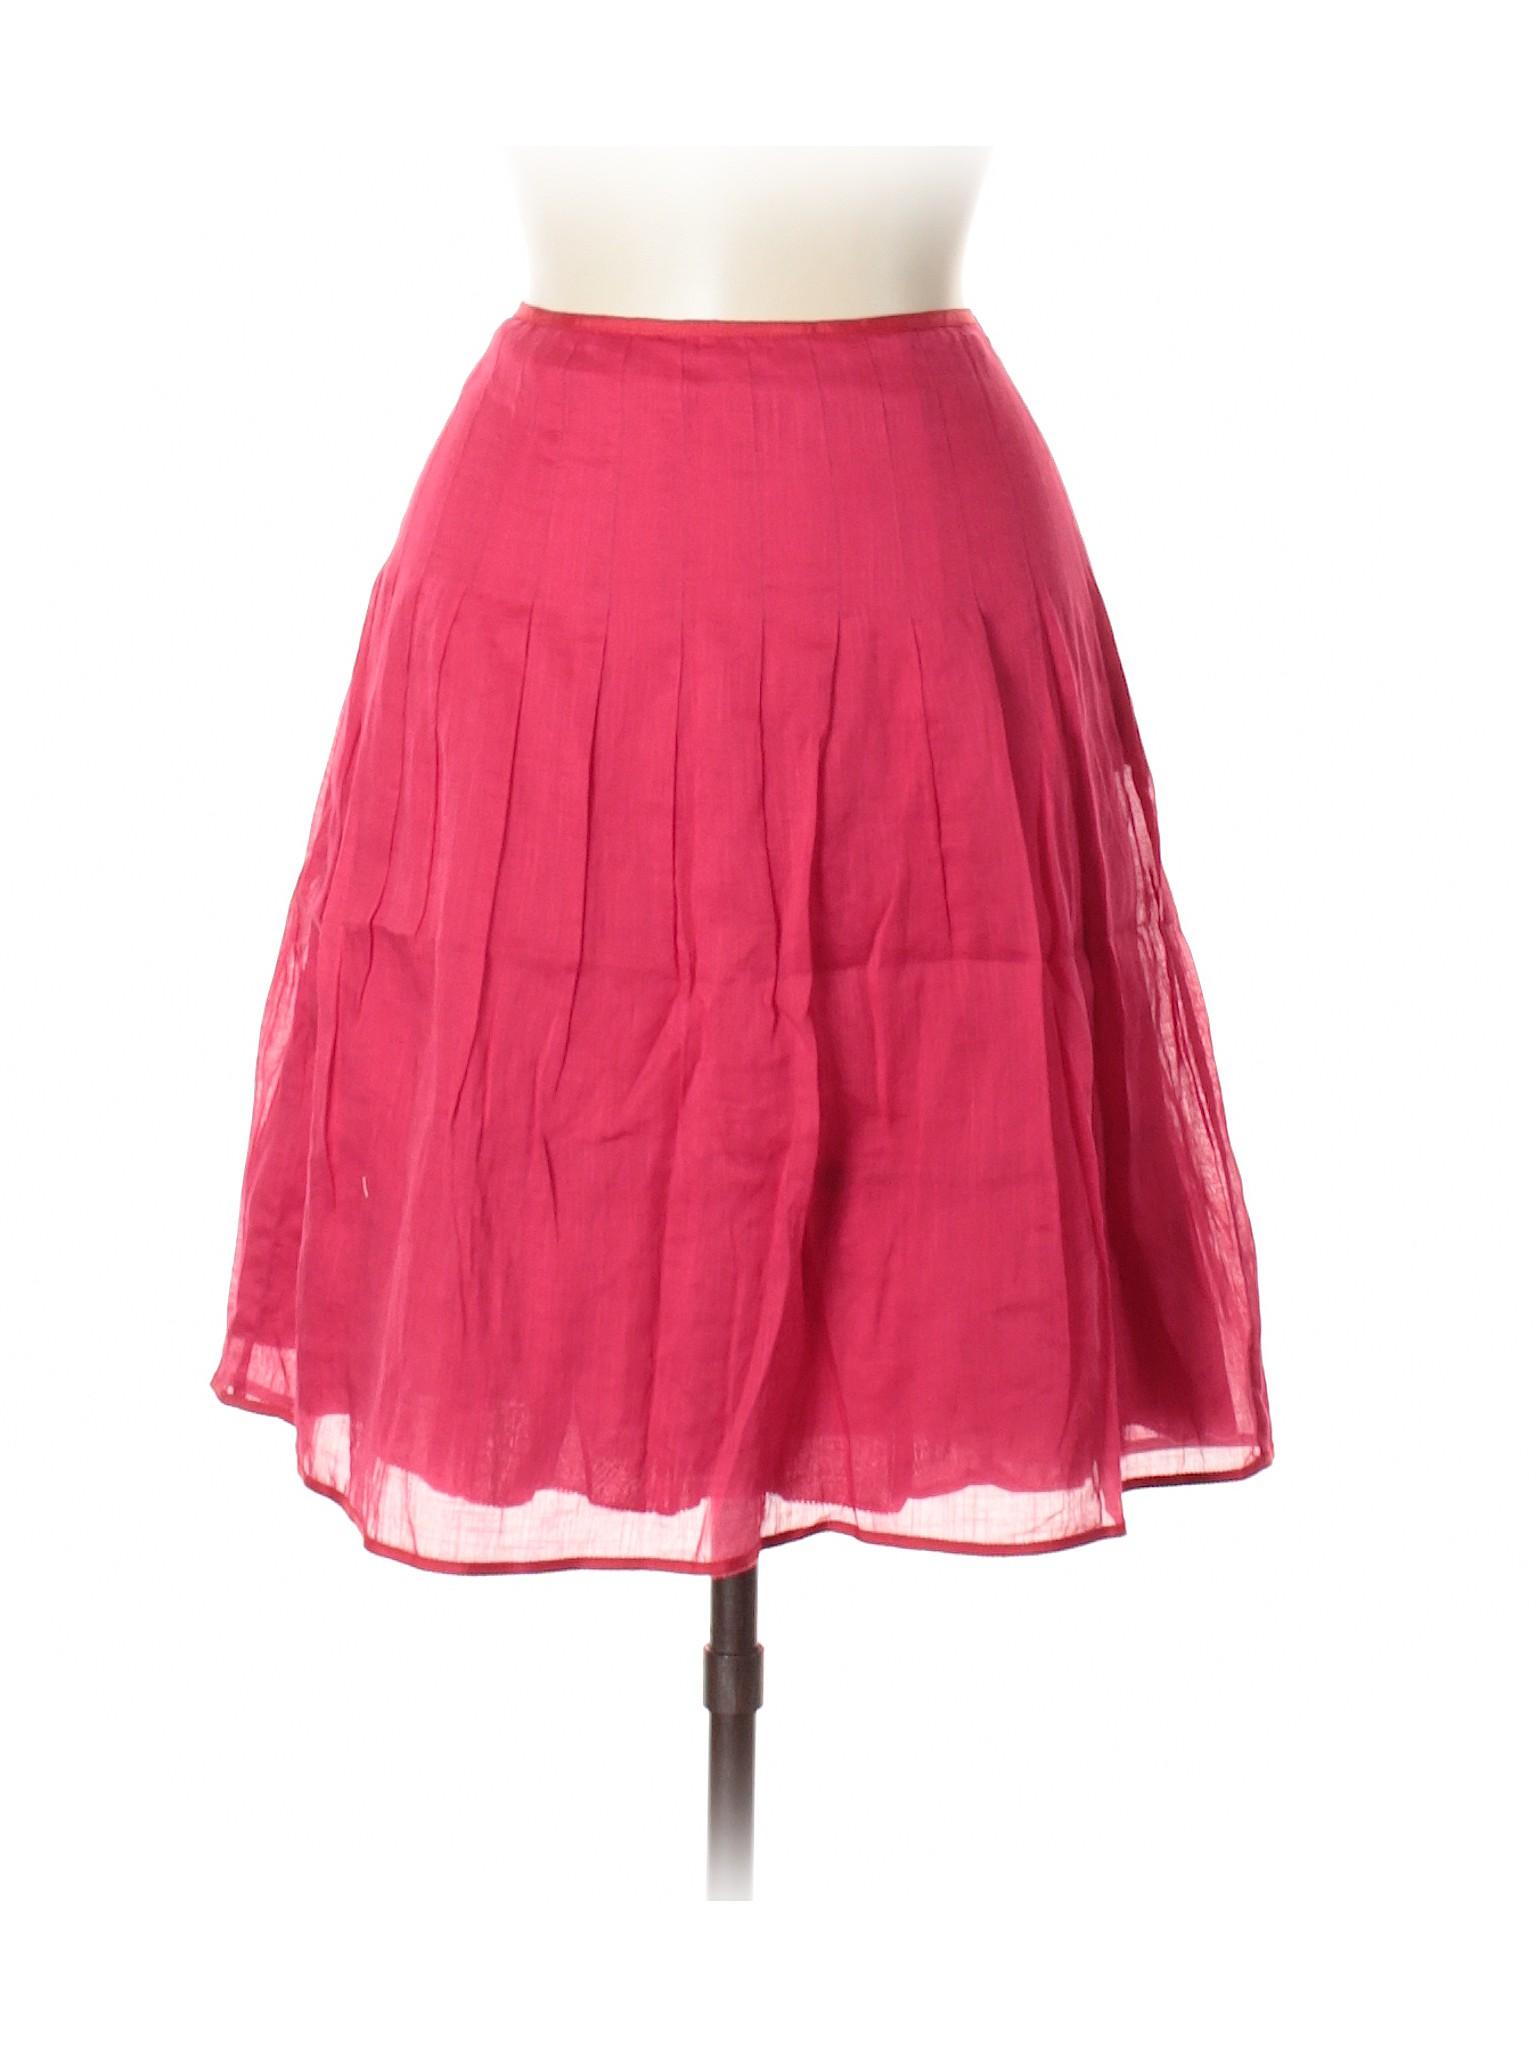 Boutique Skirt Boutique Casual Casual Skirt 4p1qd4v